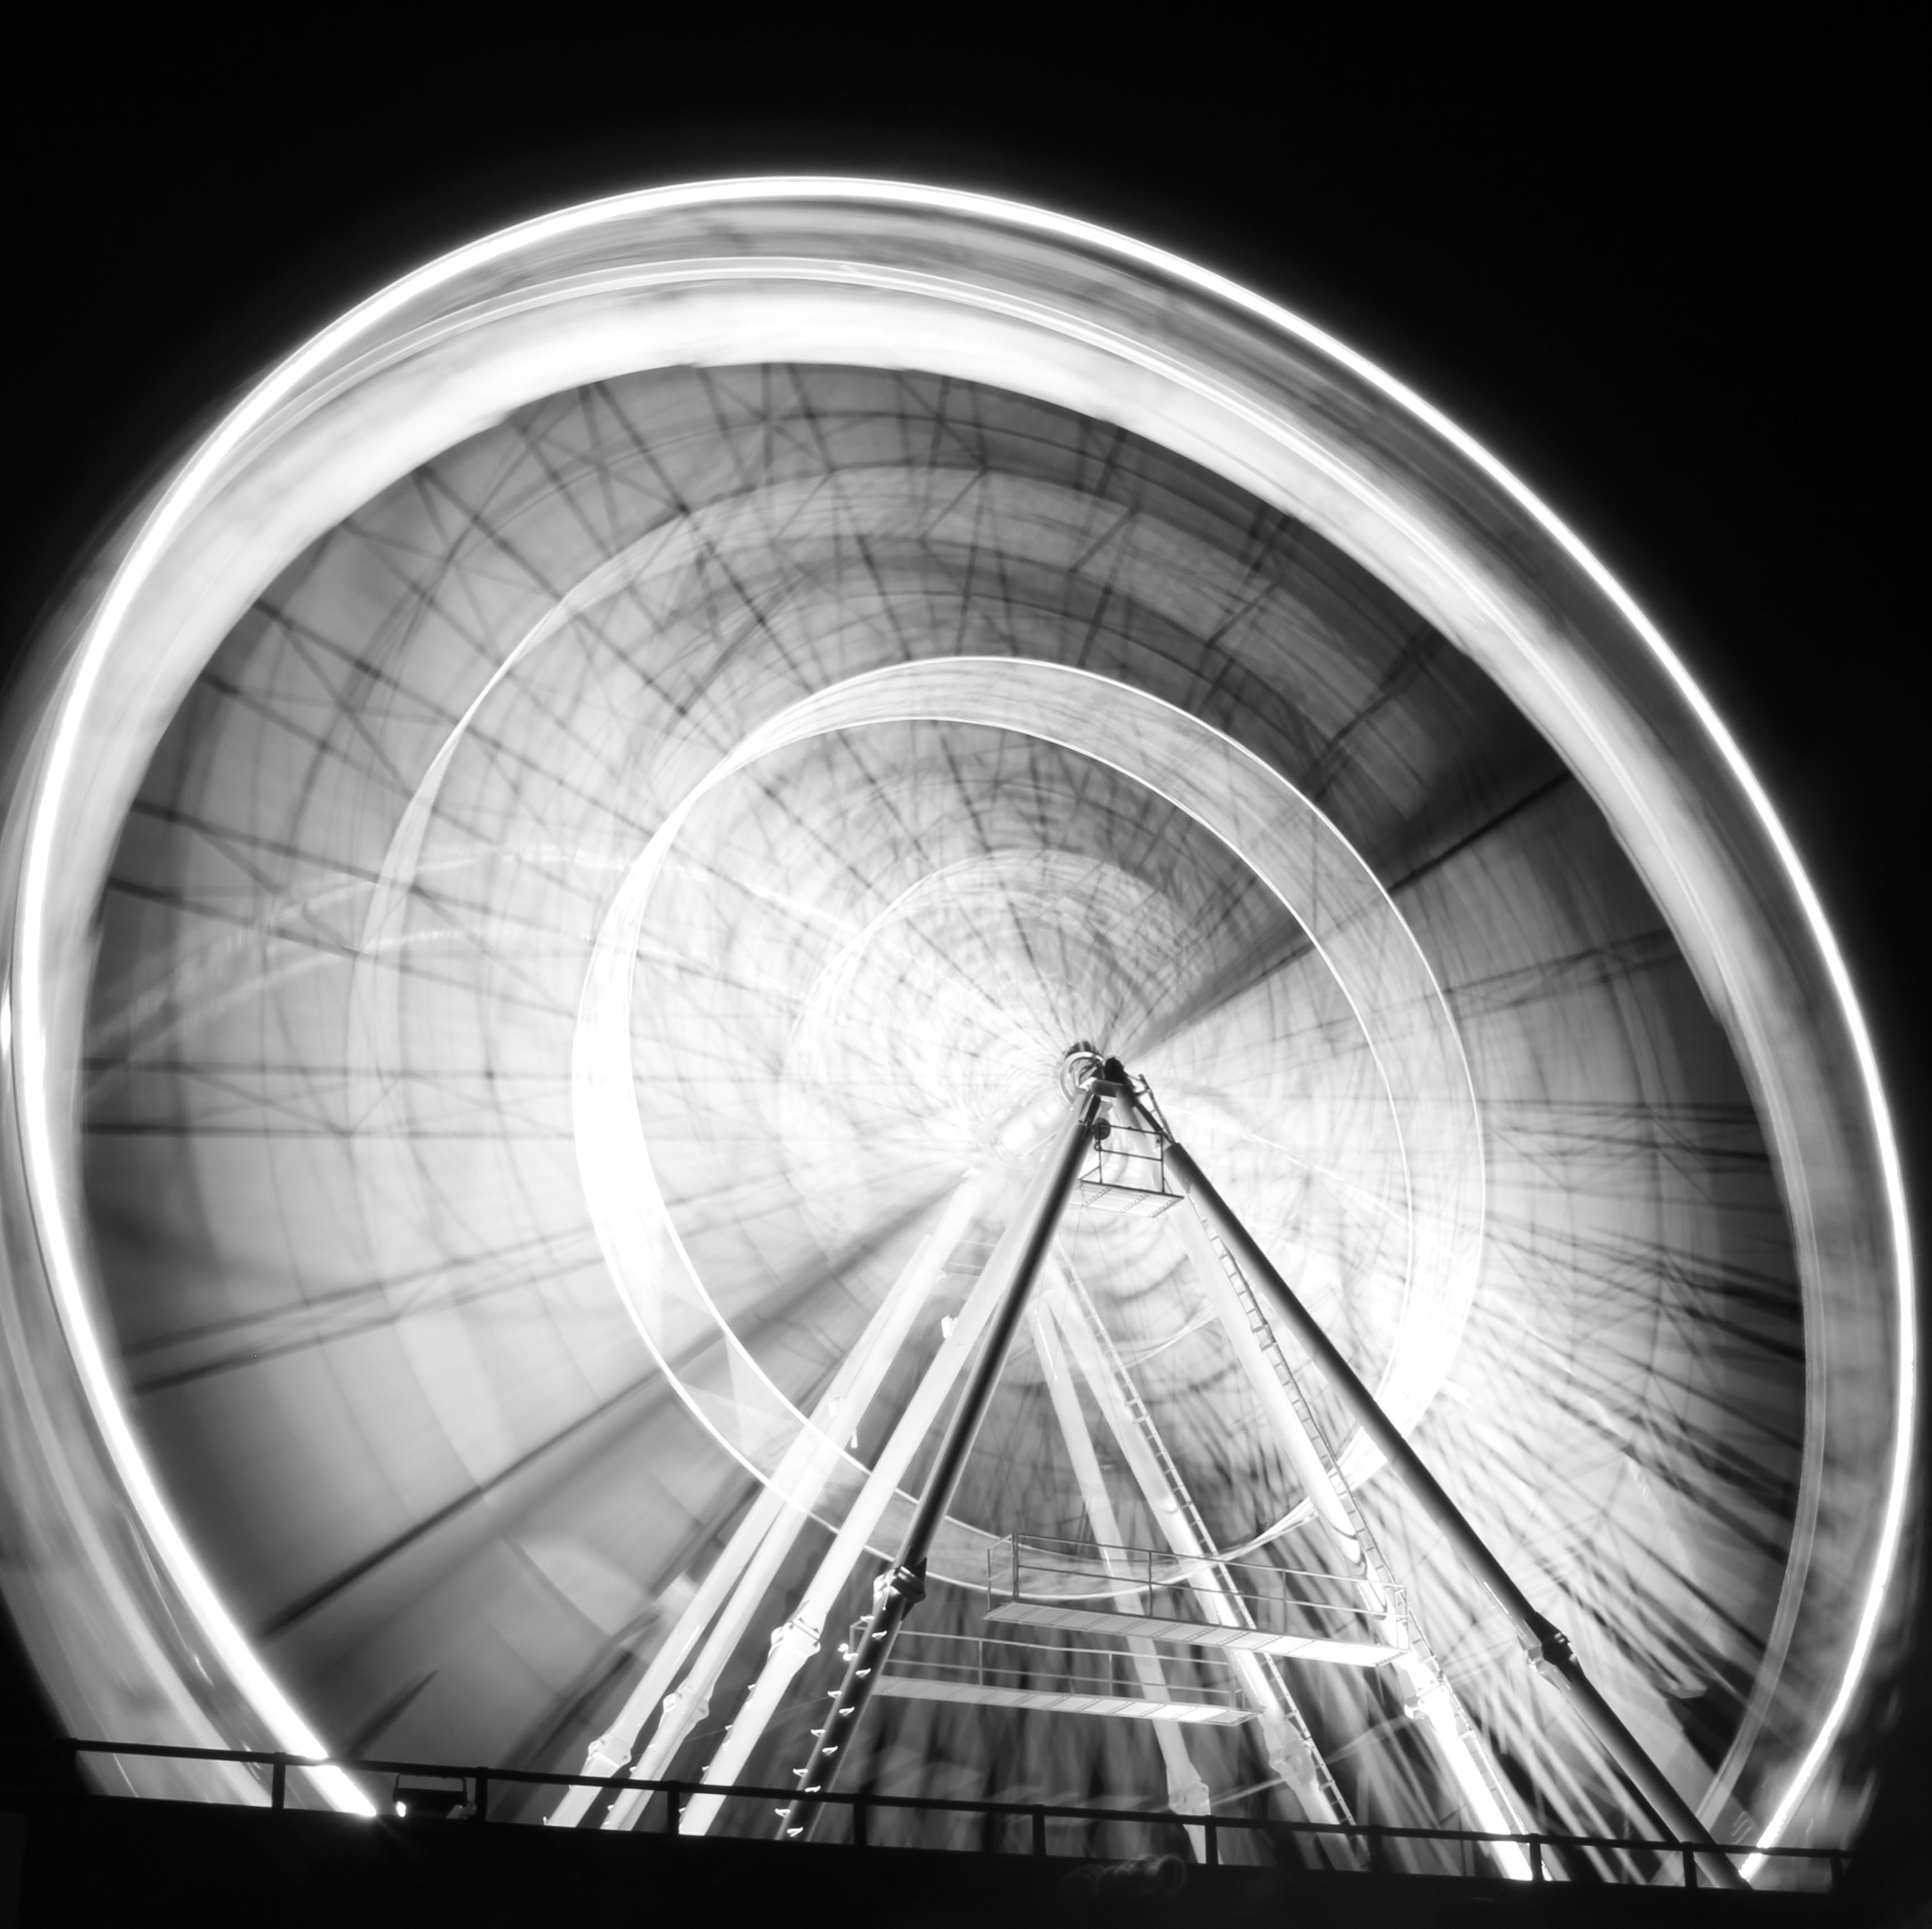 Long Exposure Photography Of Ferris Wheel